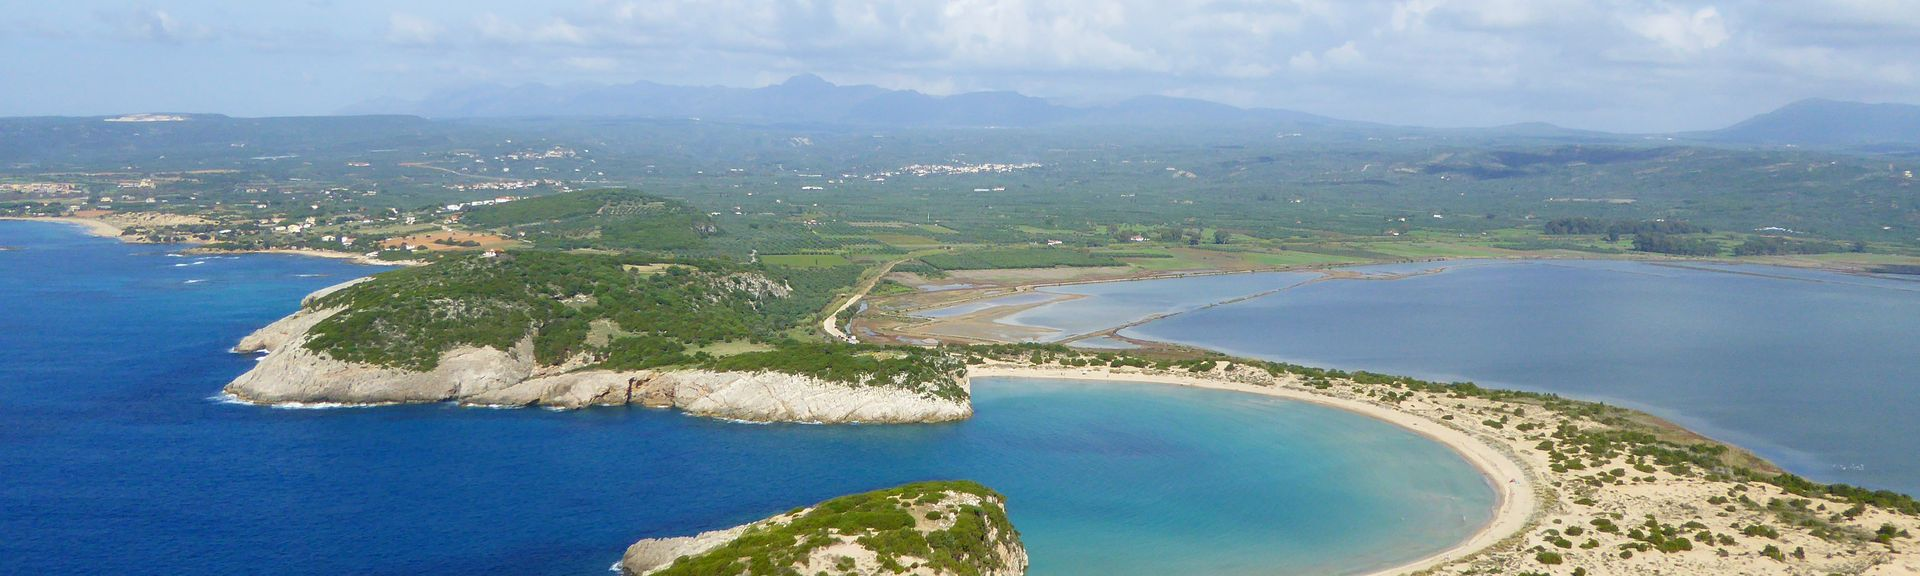 Petalidi, Messini, Peloponnese, Greece